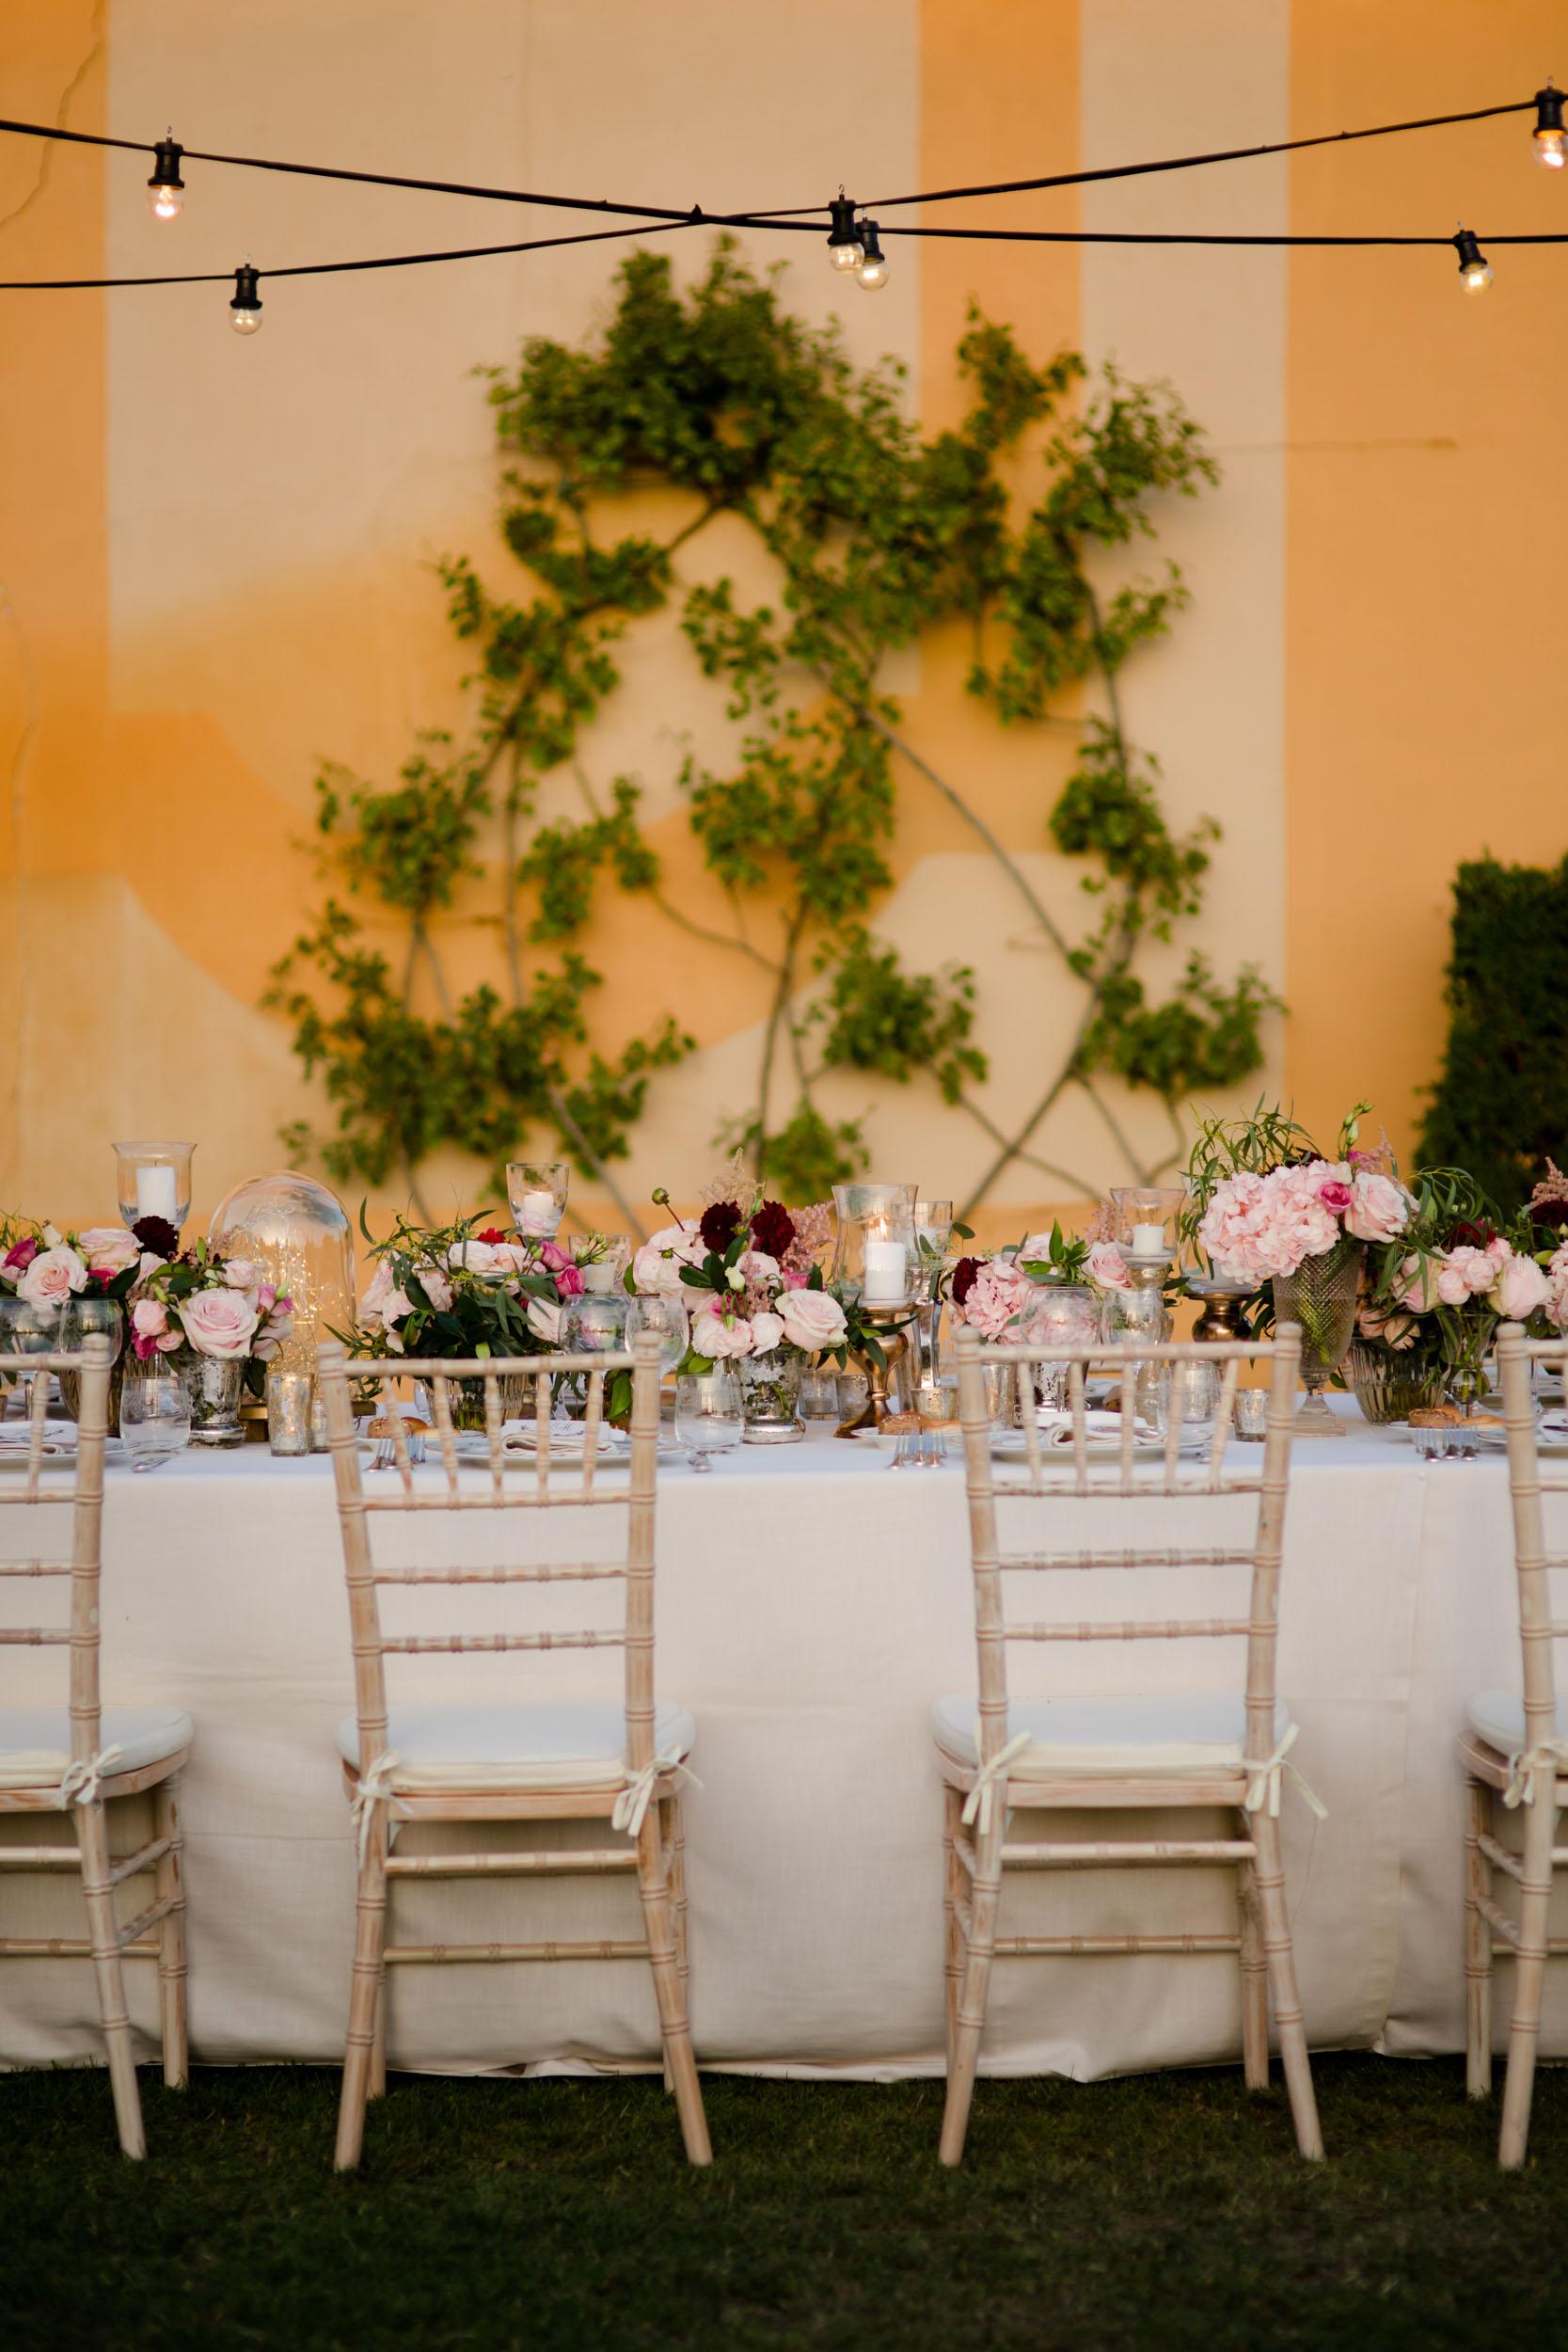 villa-gamberaia-florence-italy-destination-wedding-65.jpg